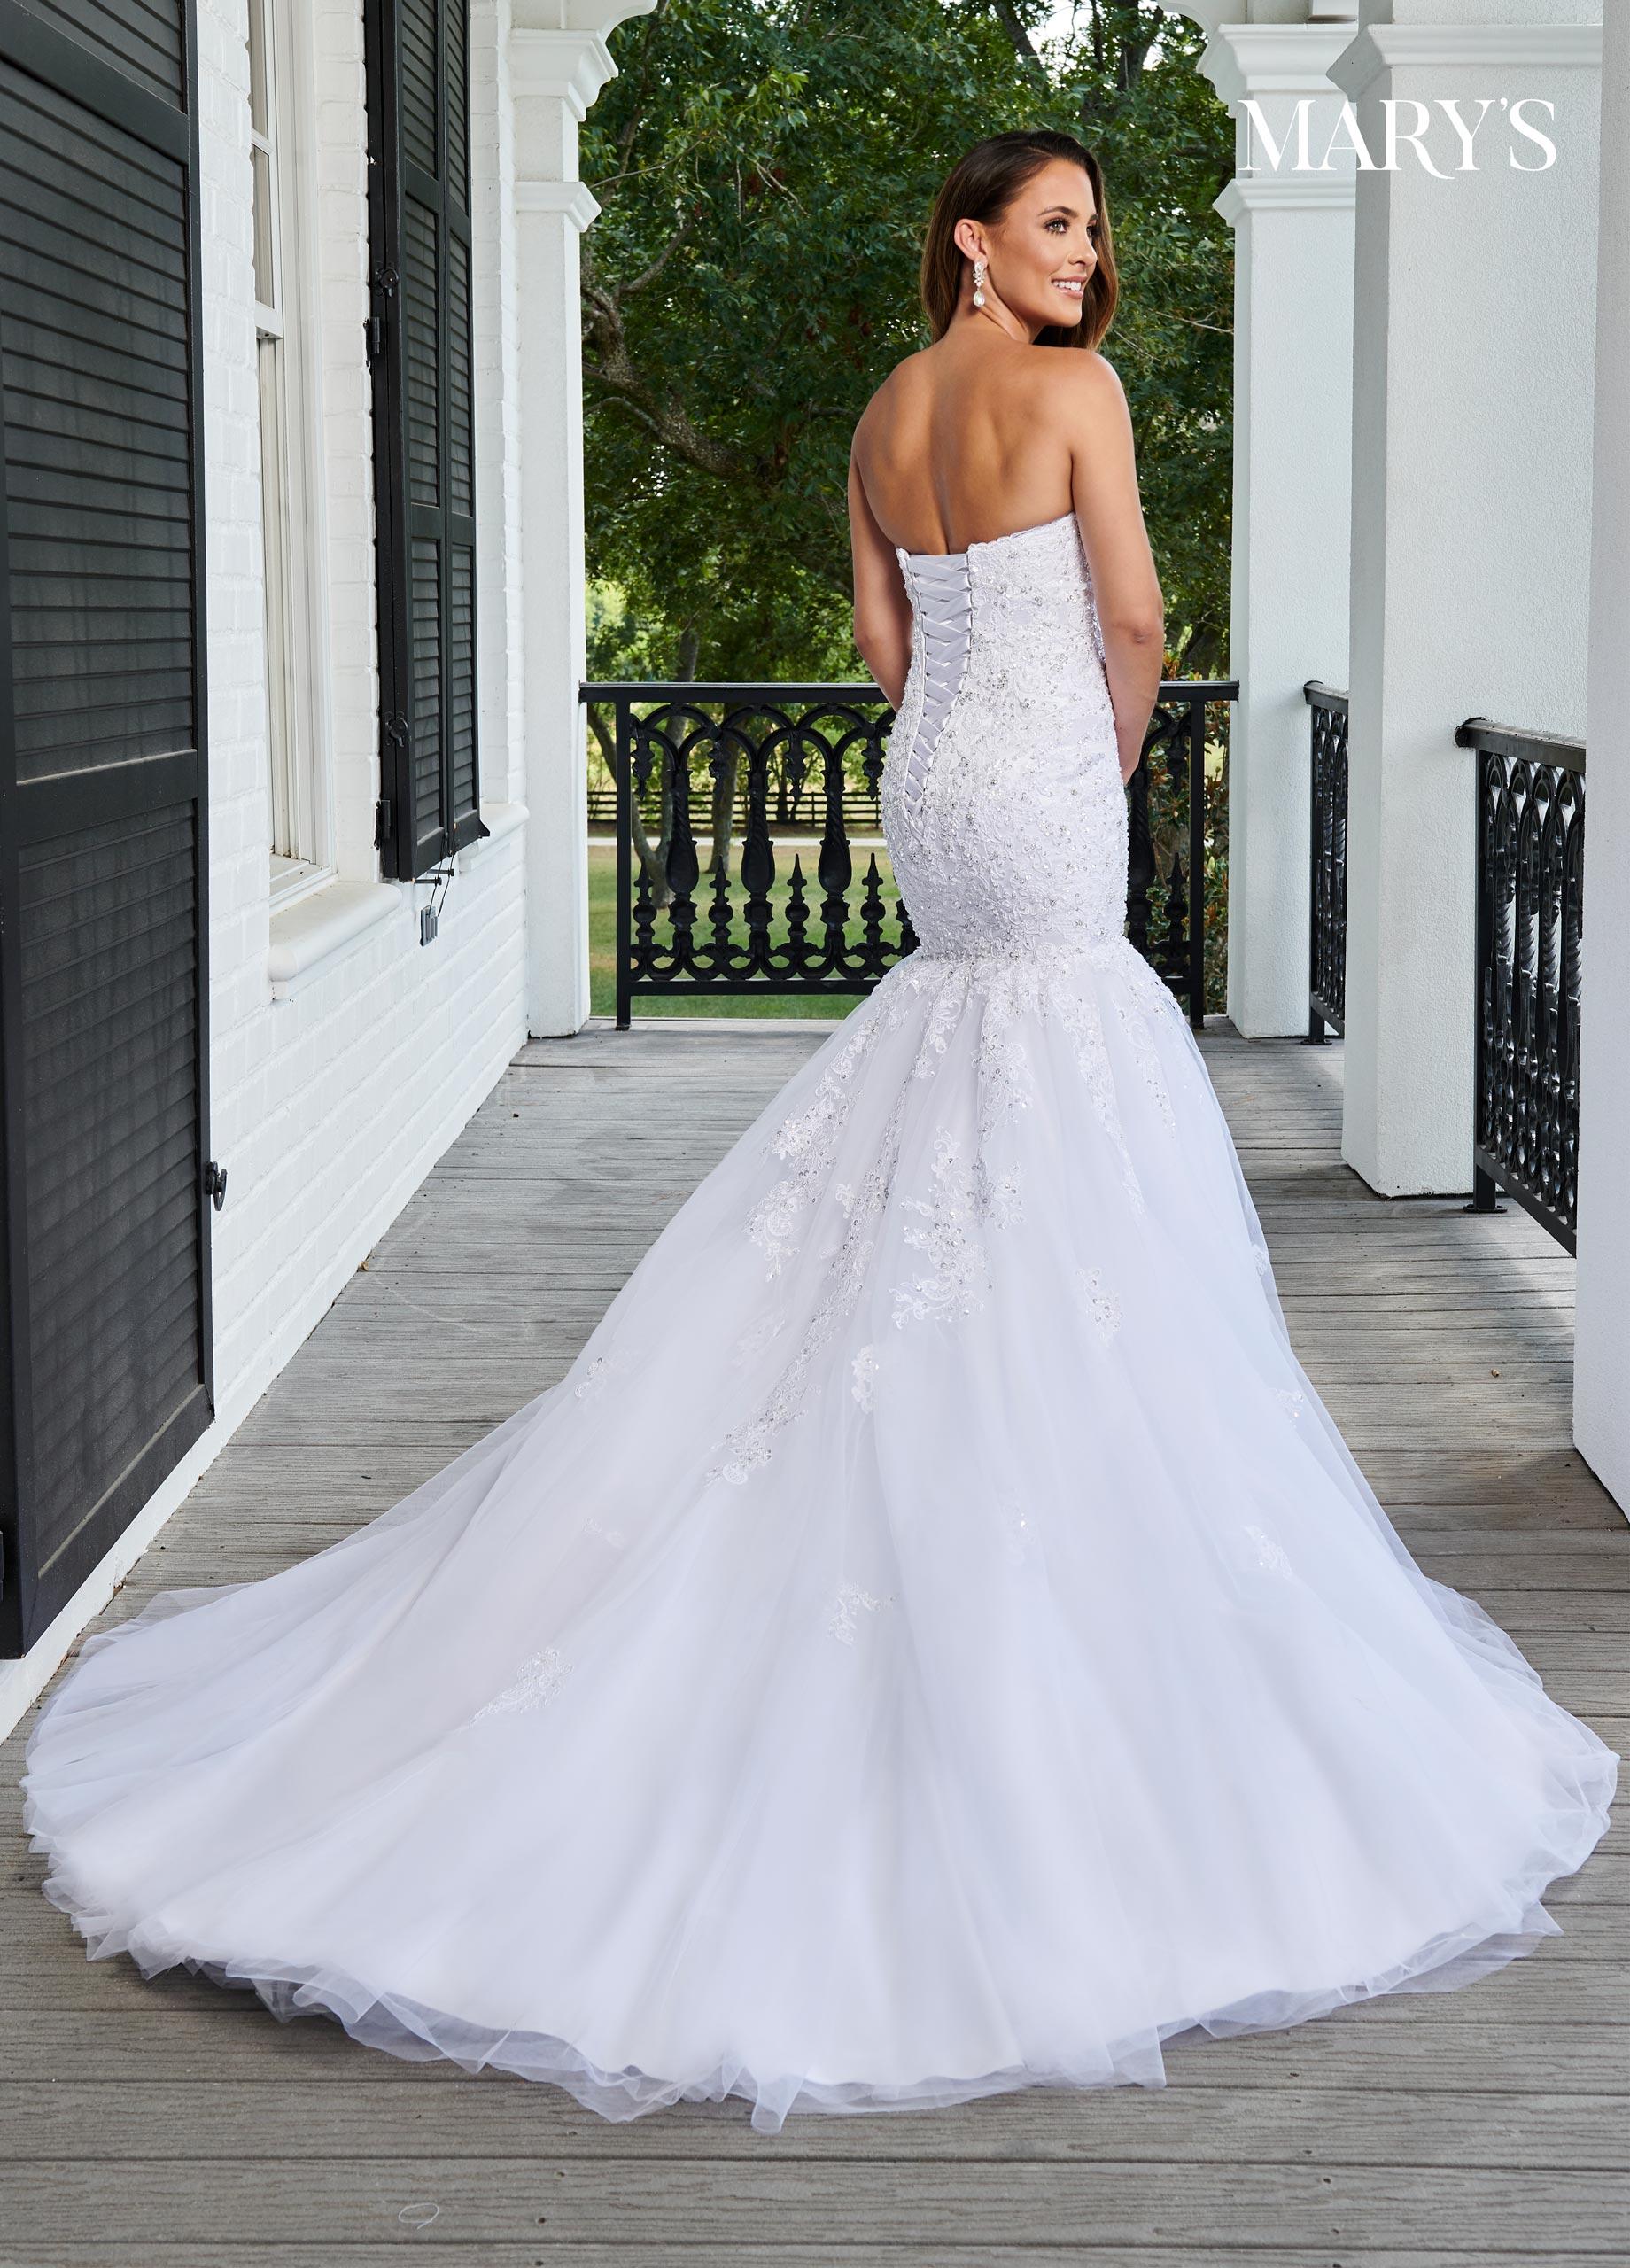 Bridal Wedding Dresses | Mary's | Style - 6207